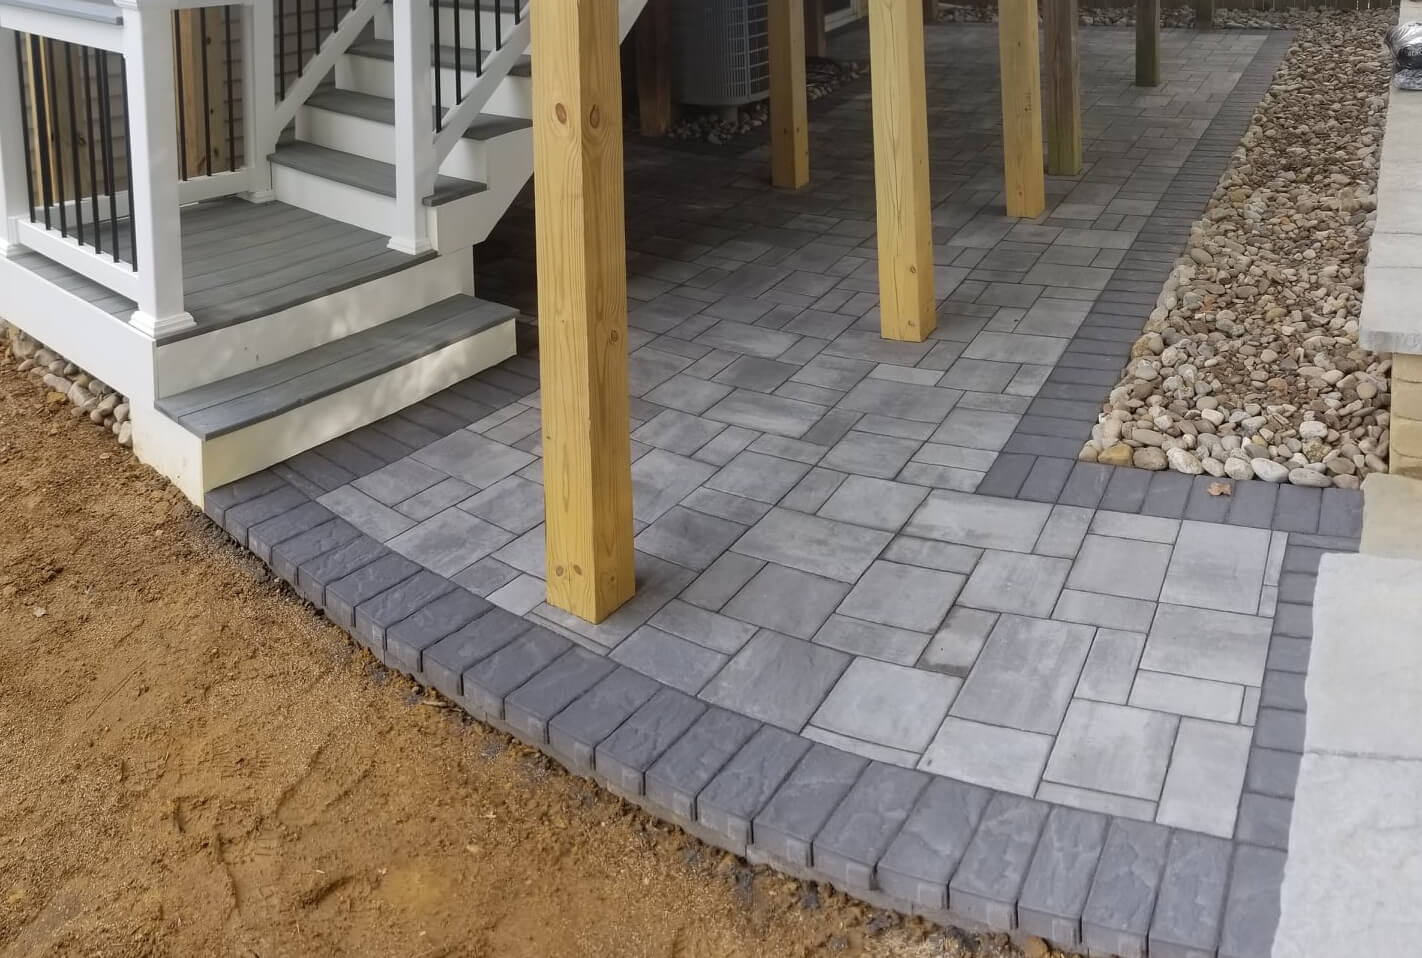 crofton maryland back yard paver patio